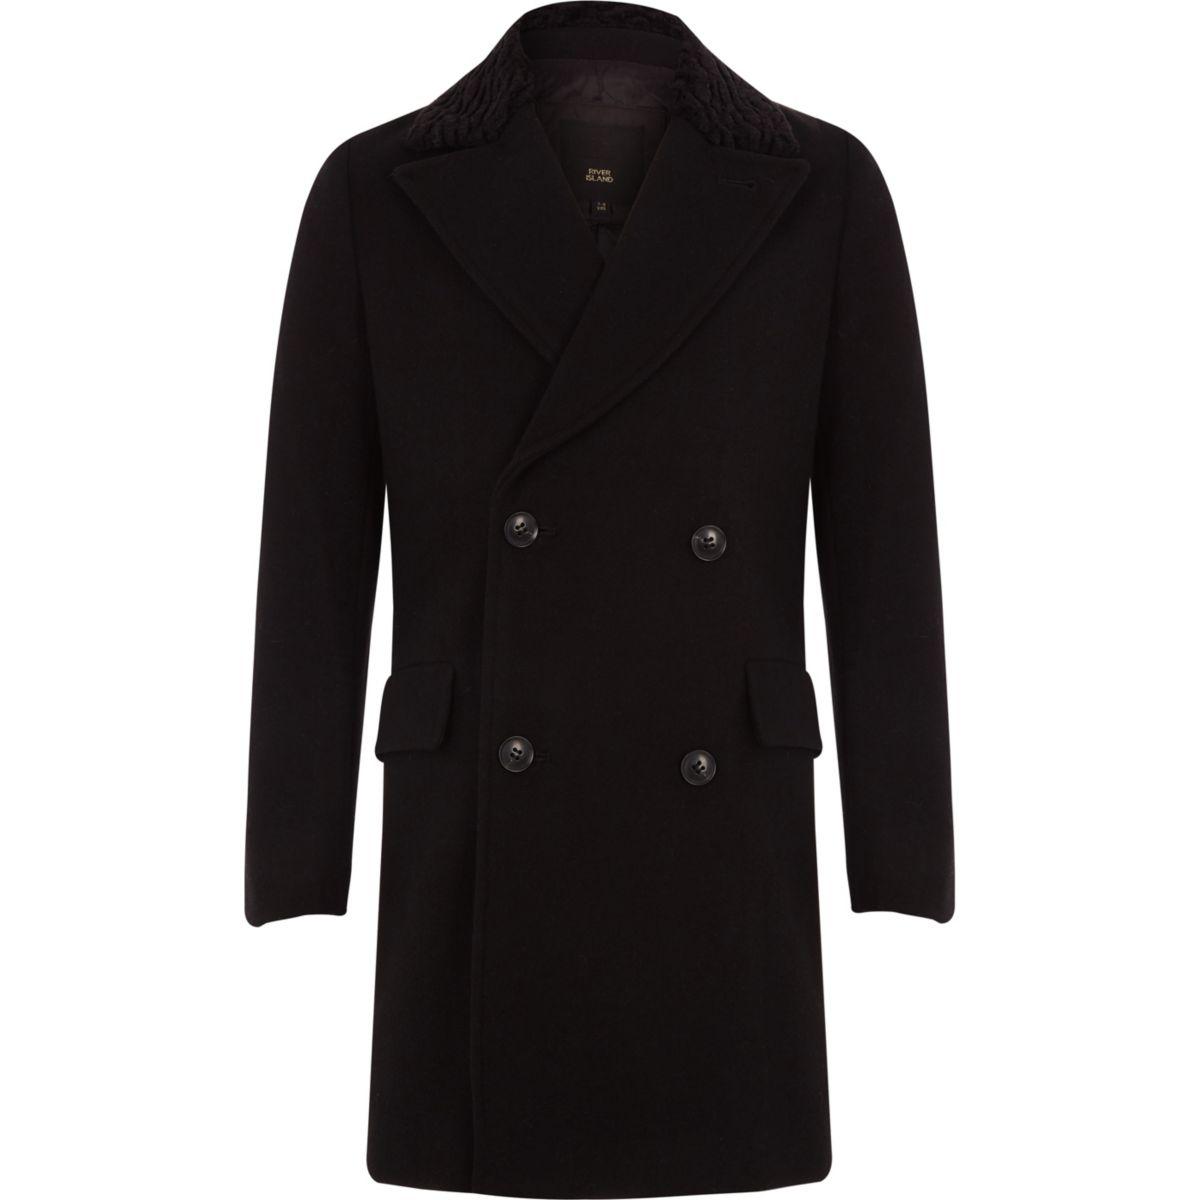 RI 30 boys black double breasted wool coat